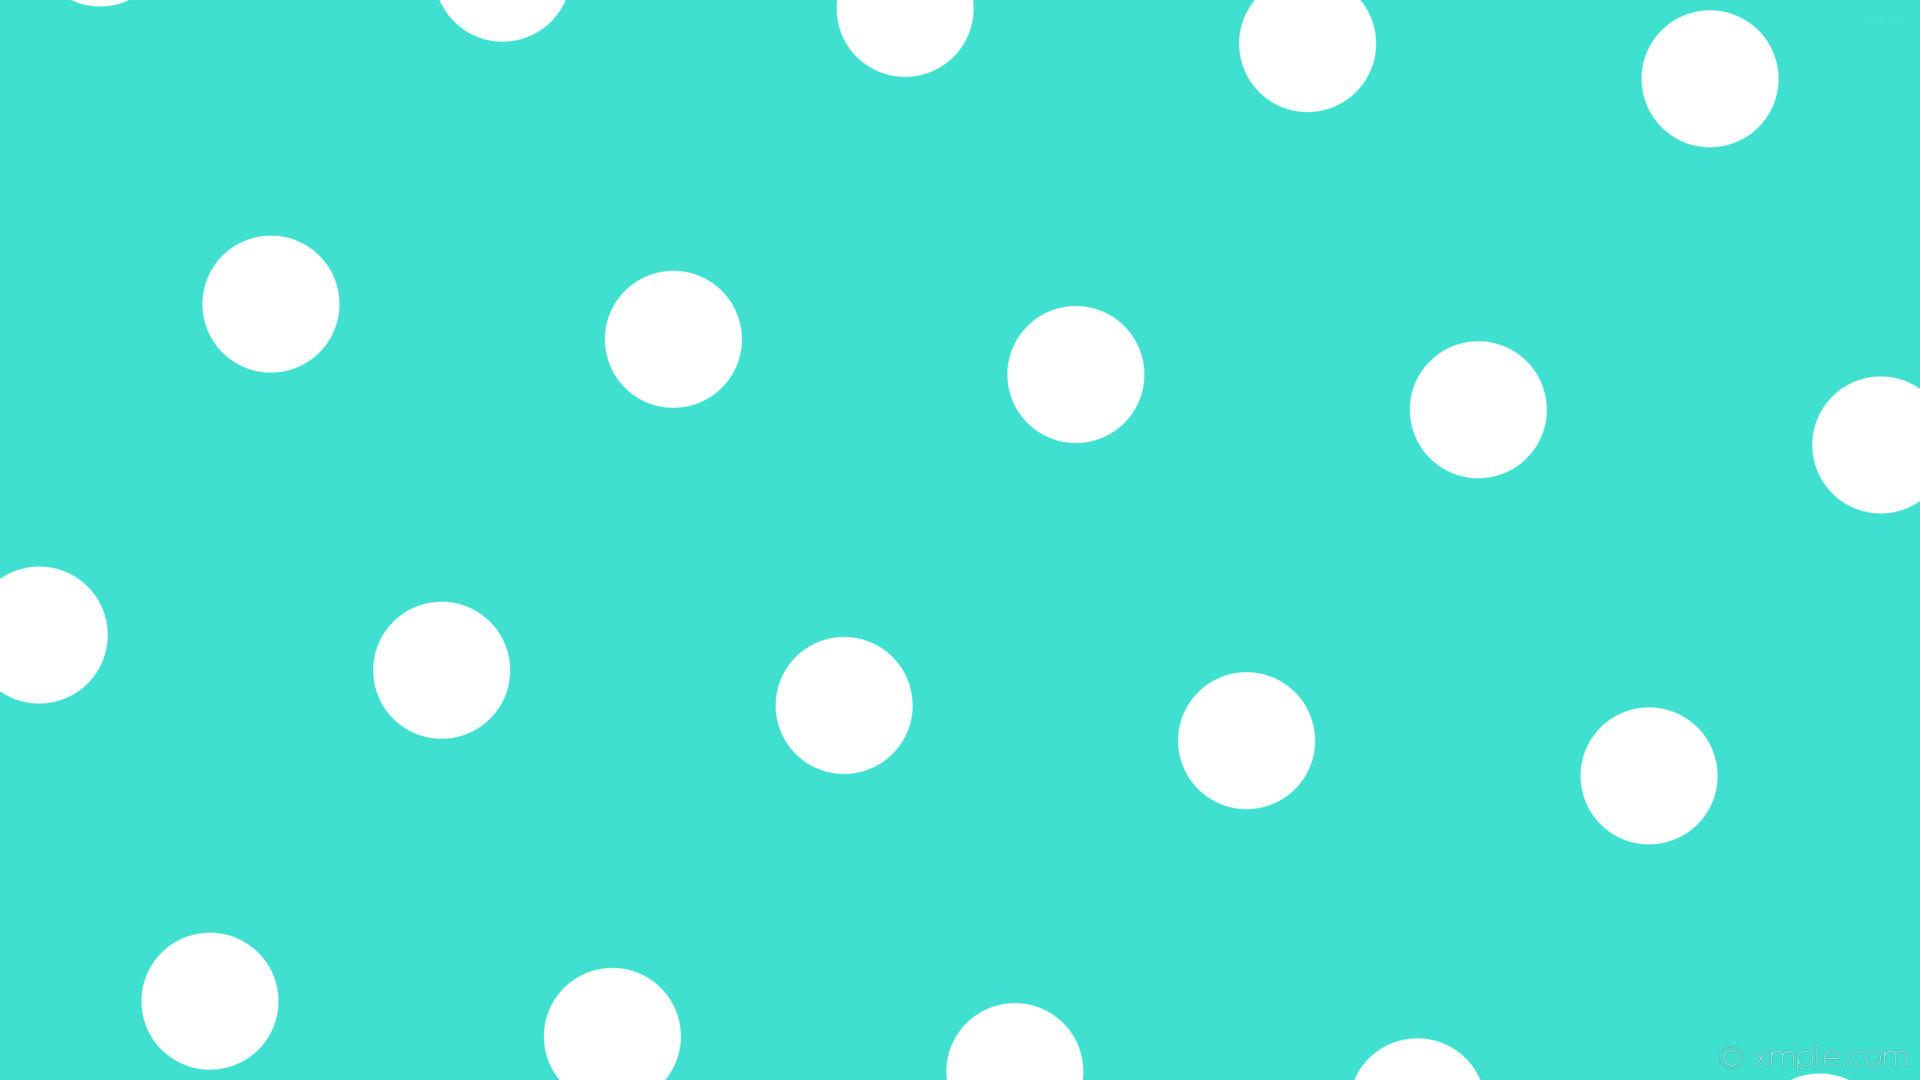 wallpaper polka dots white blue hexagon turquoise #40e0d0 #ffffff diagonal  55° 137px 404px